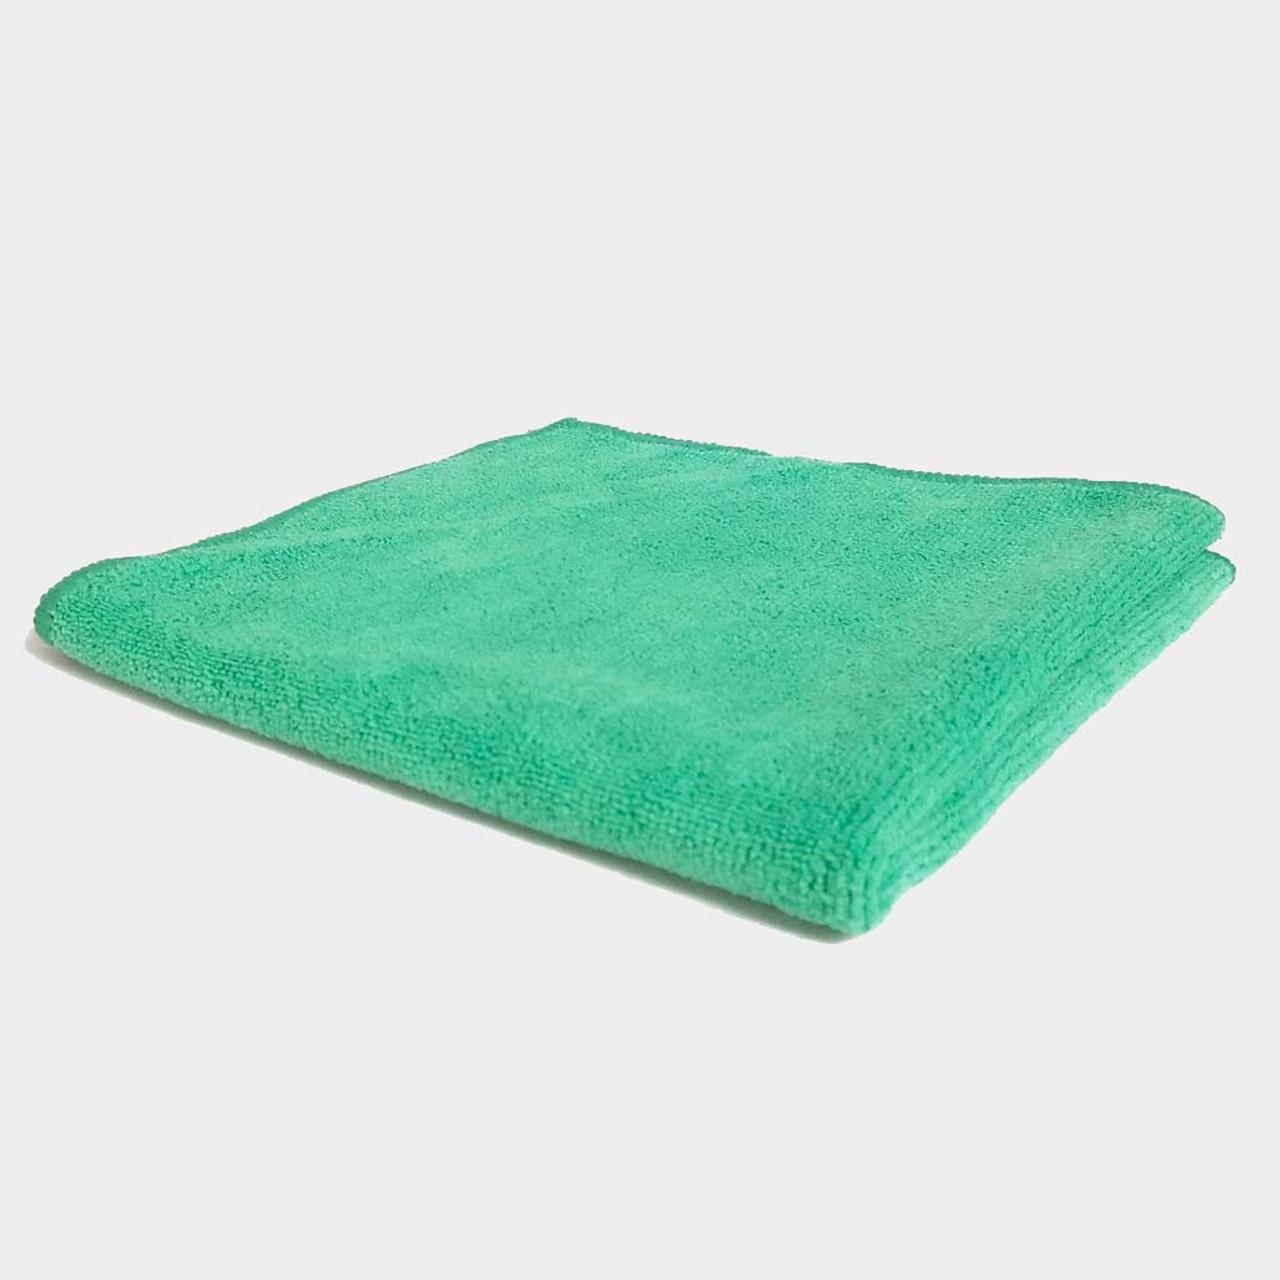 Greenmicrofiber Cloth For Car   Shinerz ShowCar